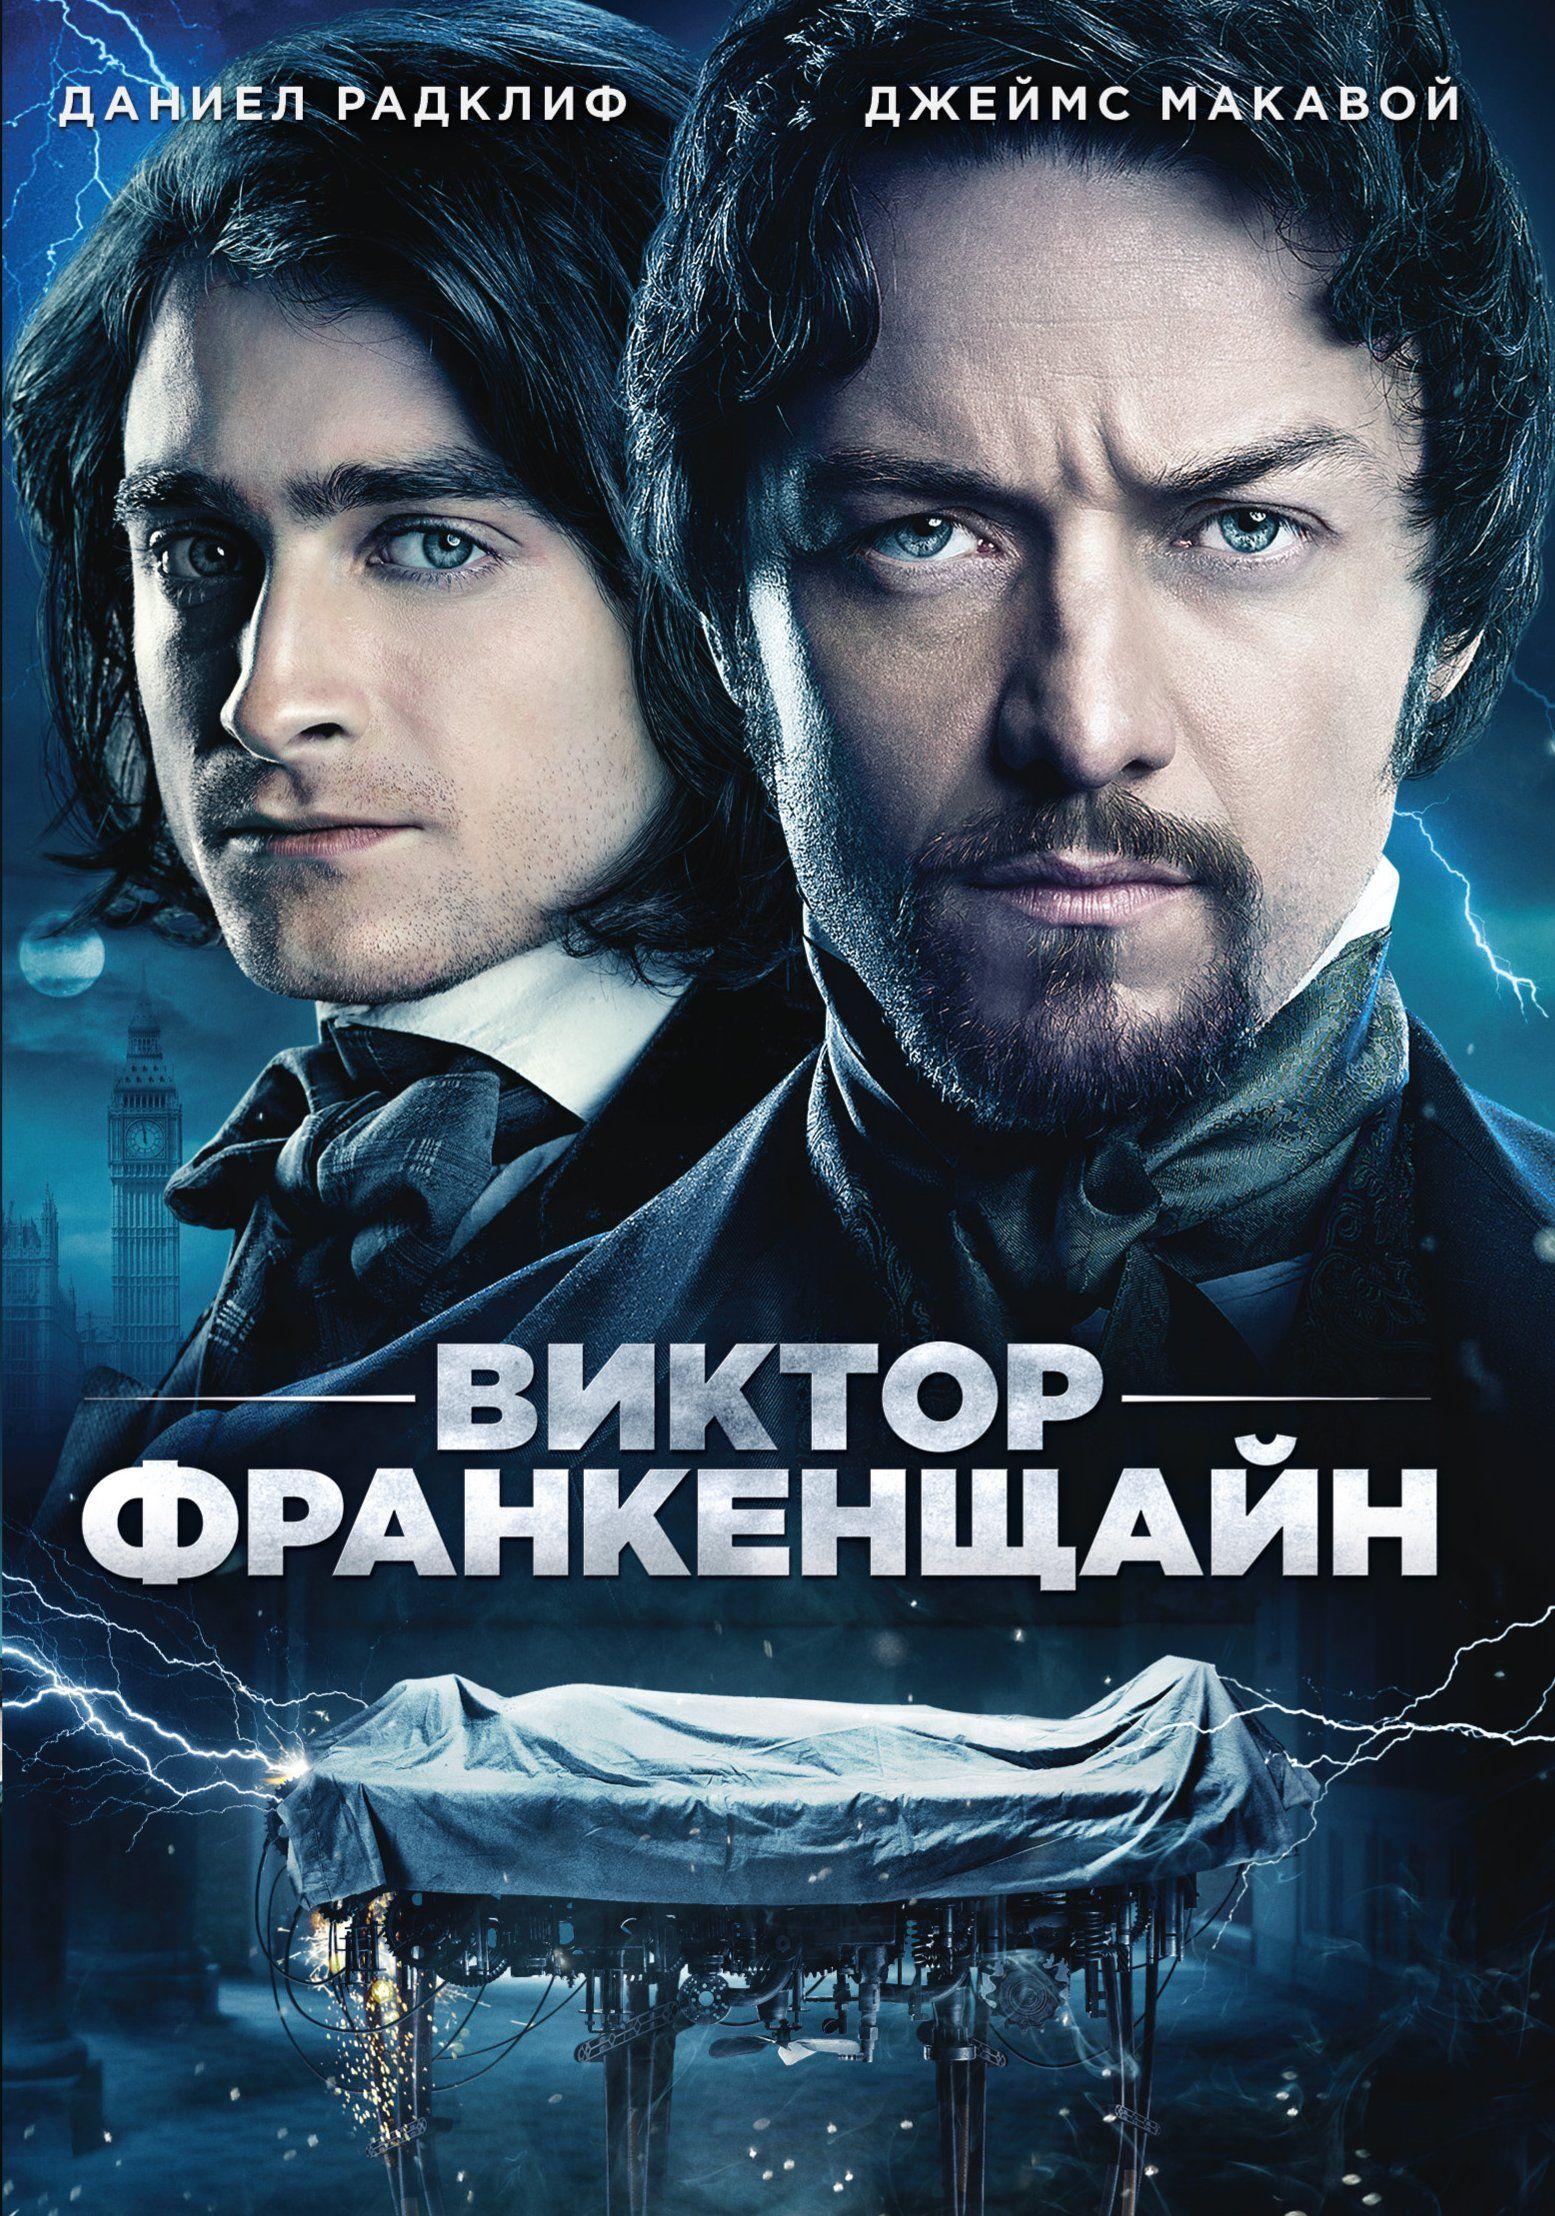 Виктор Франкенщайн (DVD) - 1